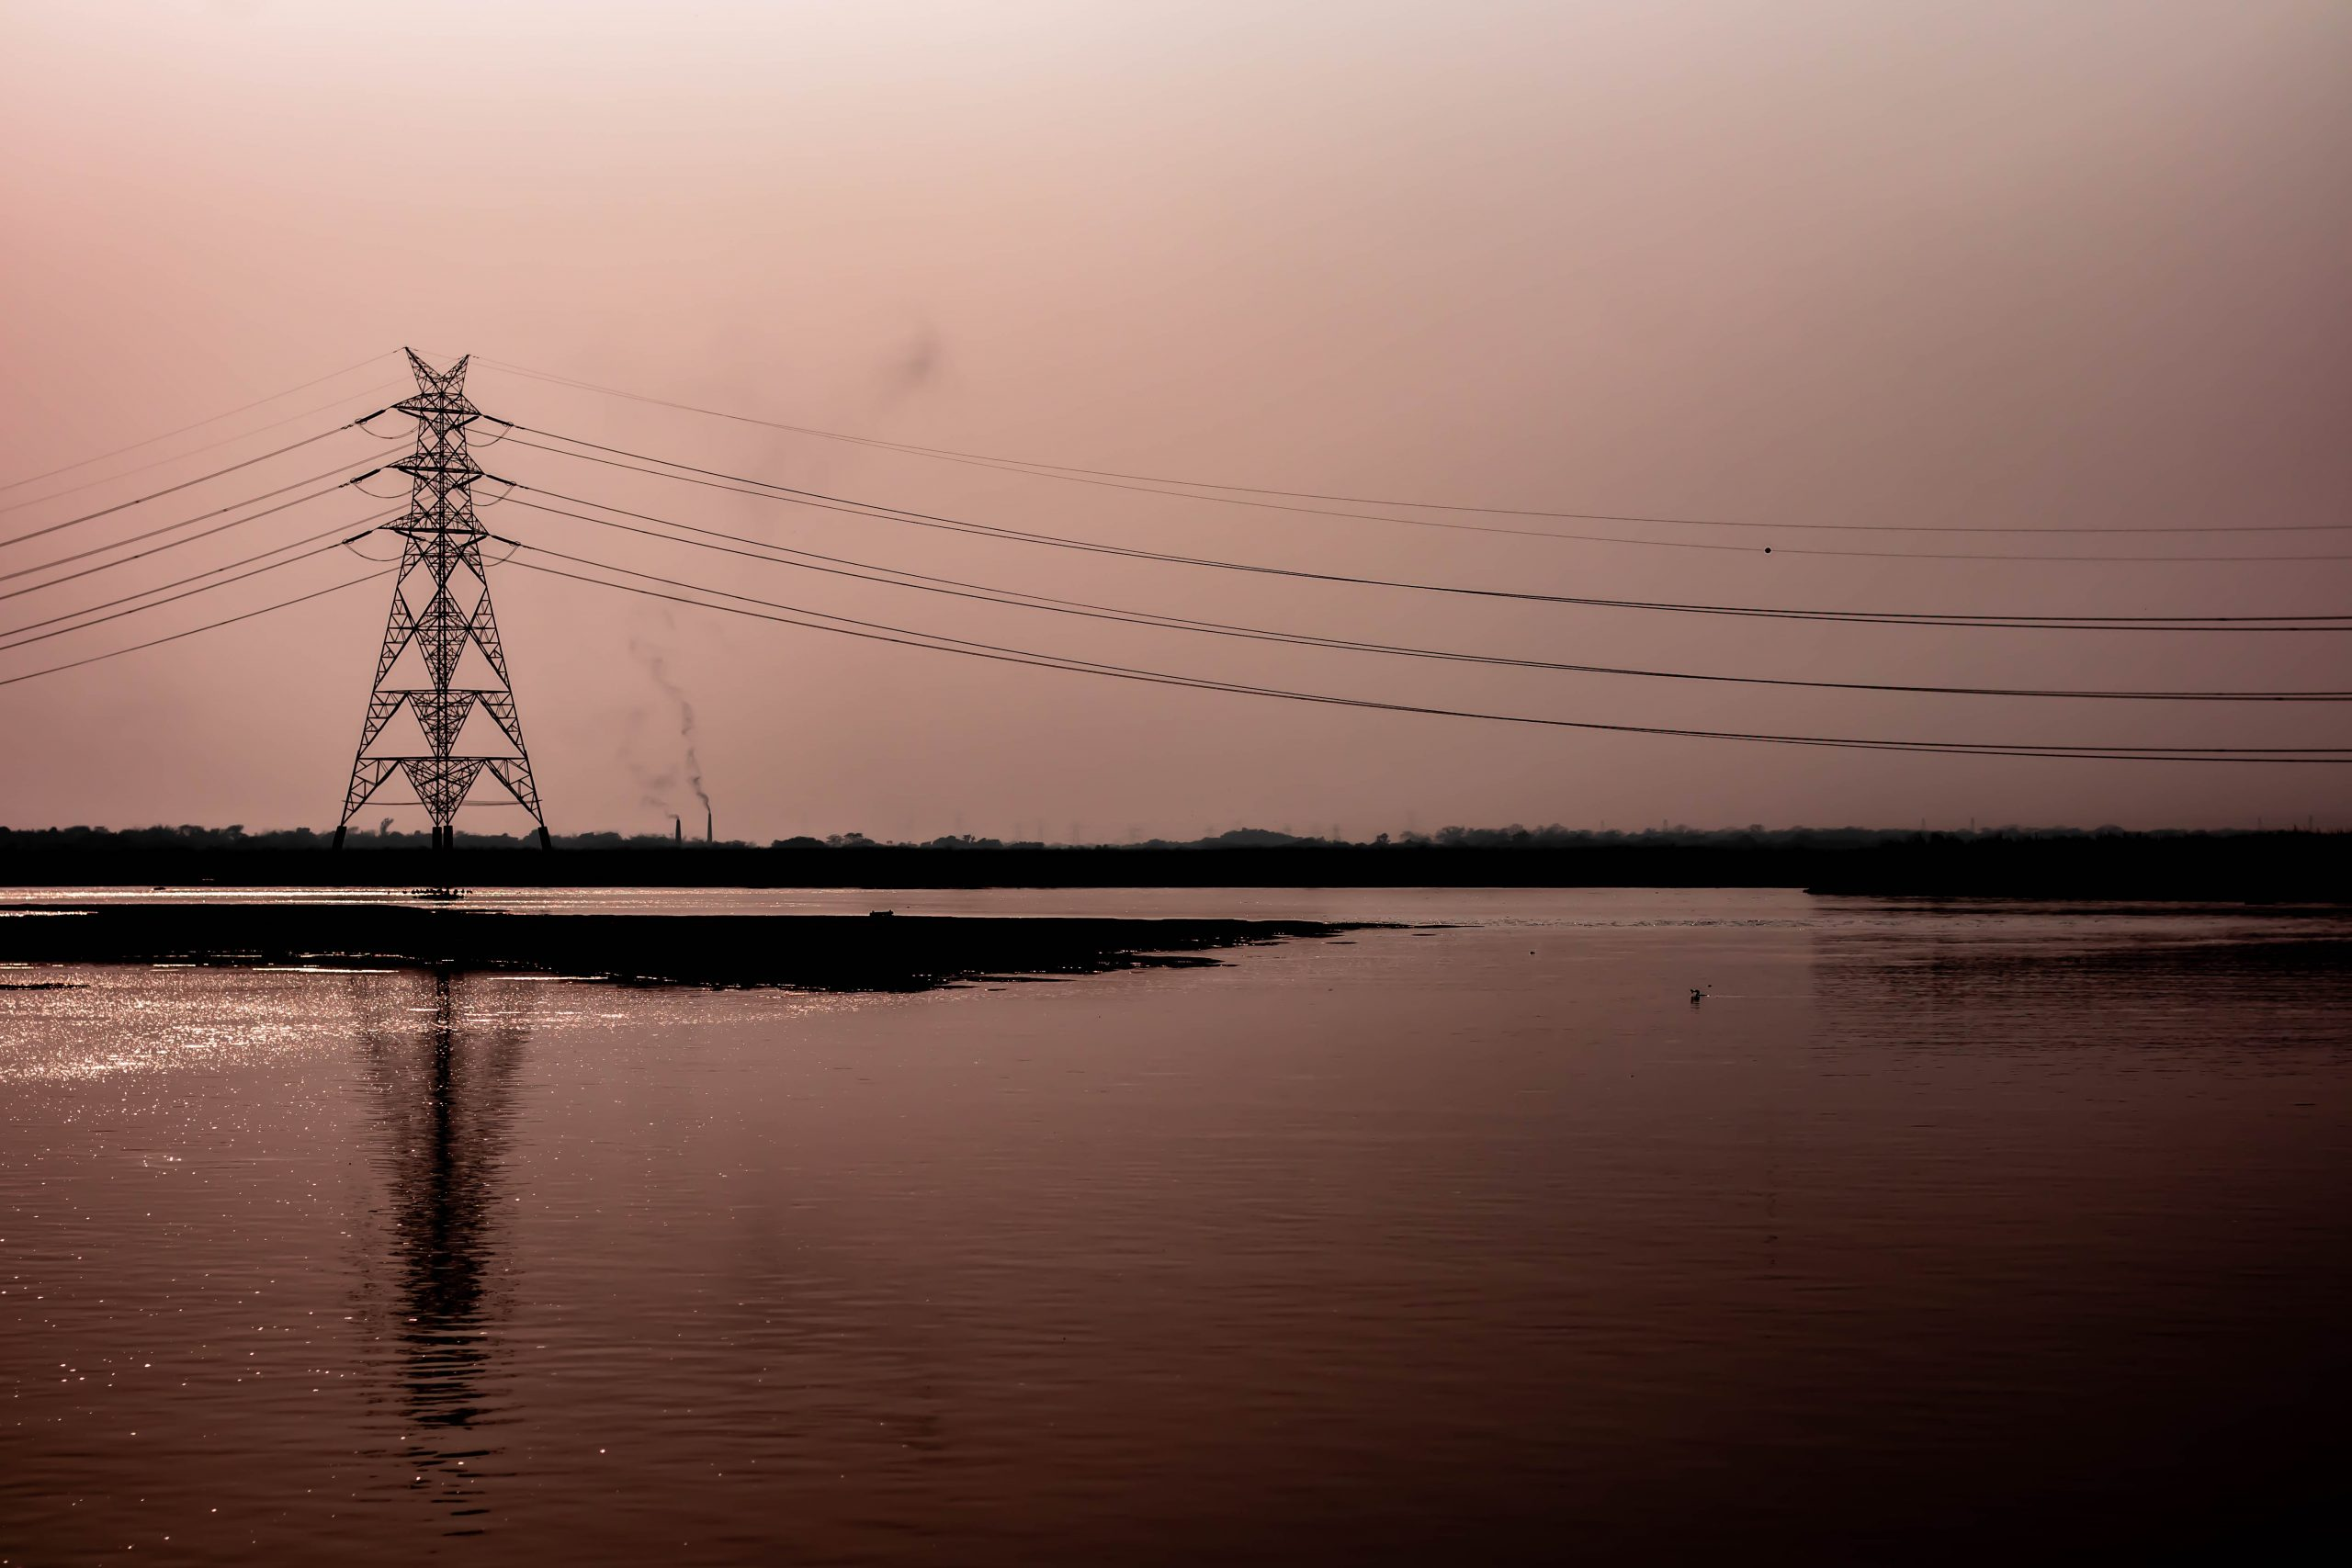 Transmission tower near Damodar River